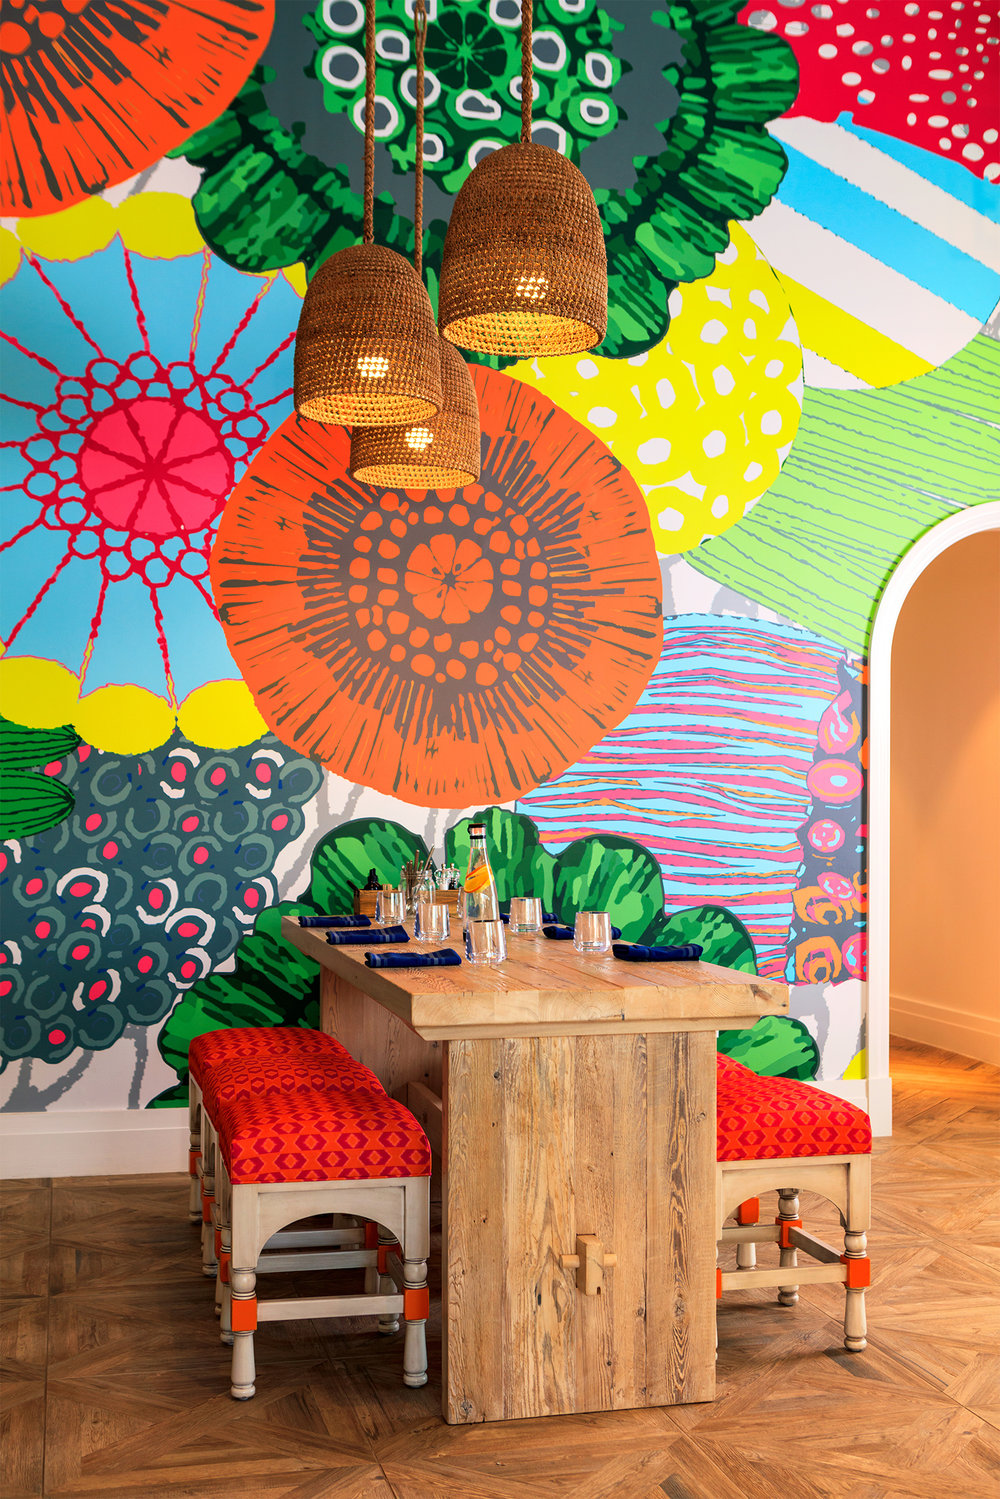 Paul Landing Indoor Mural.jpg